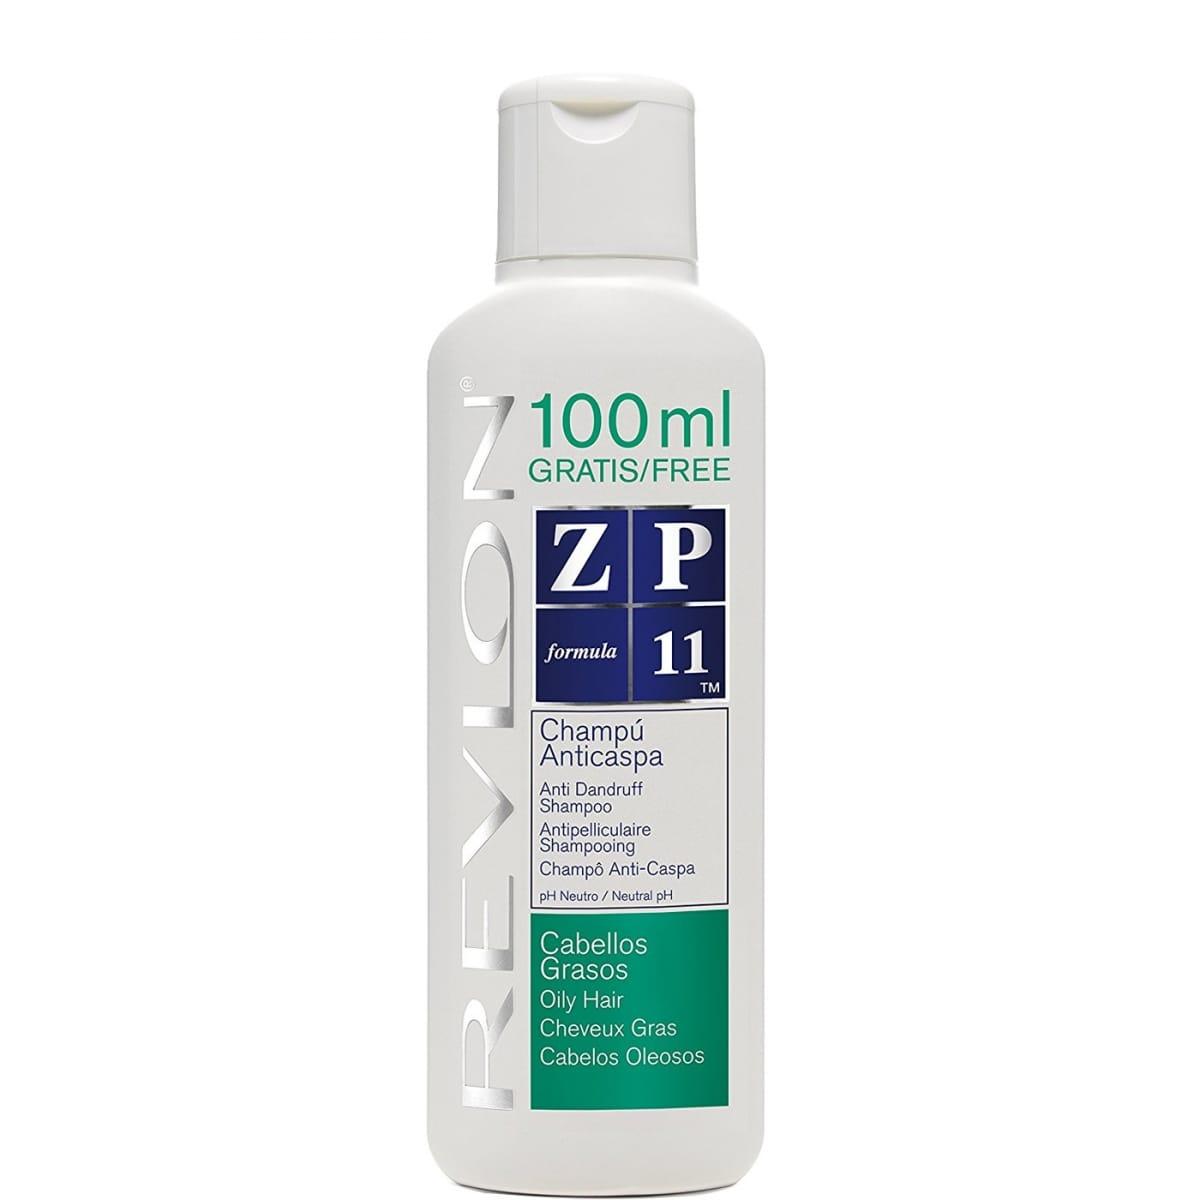 zp11 shampooing anti pelliculaire de revlon professionnal cheveux gras incenza. Black Bedroom Furniture Sets. Home Design Ideas